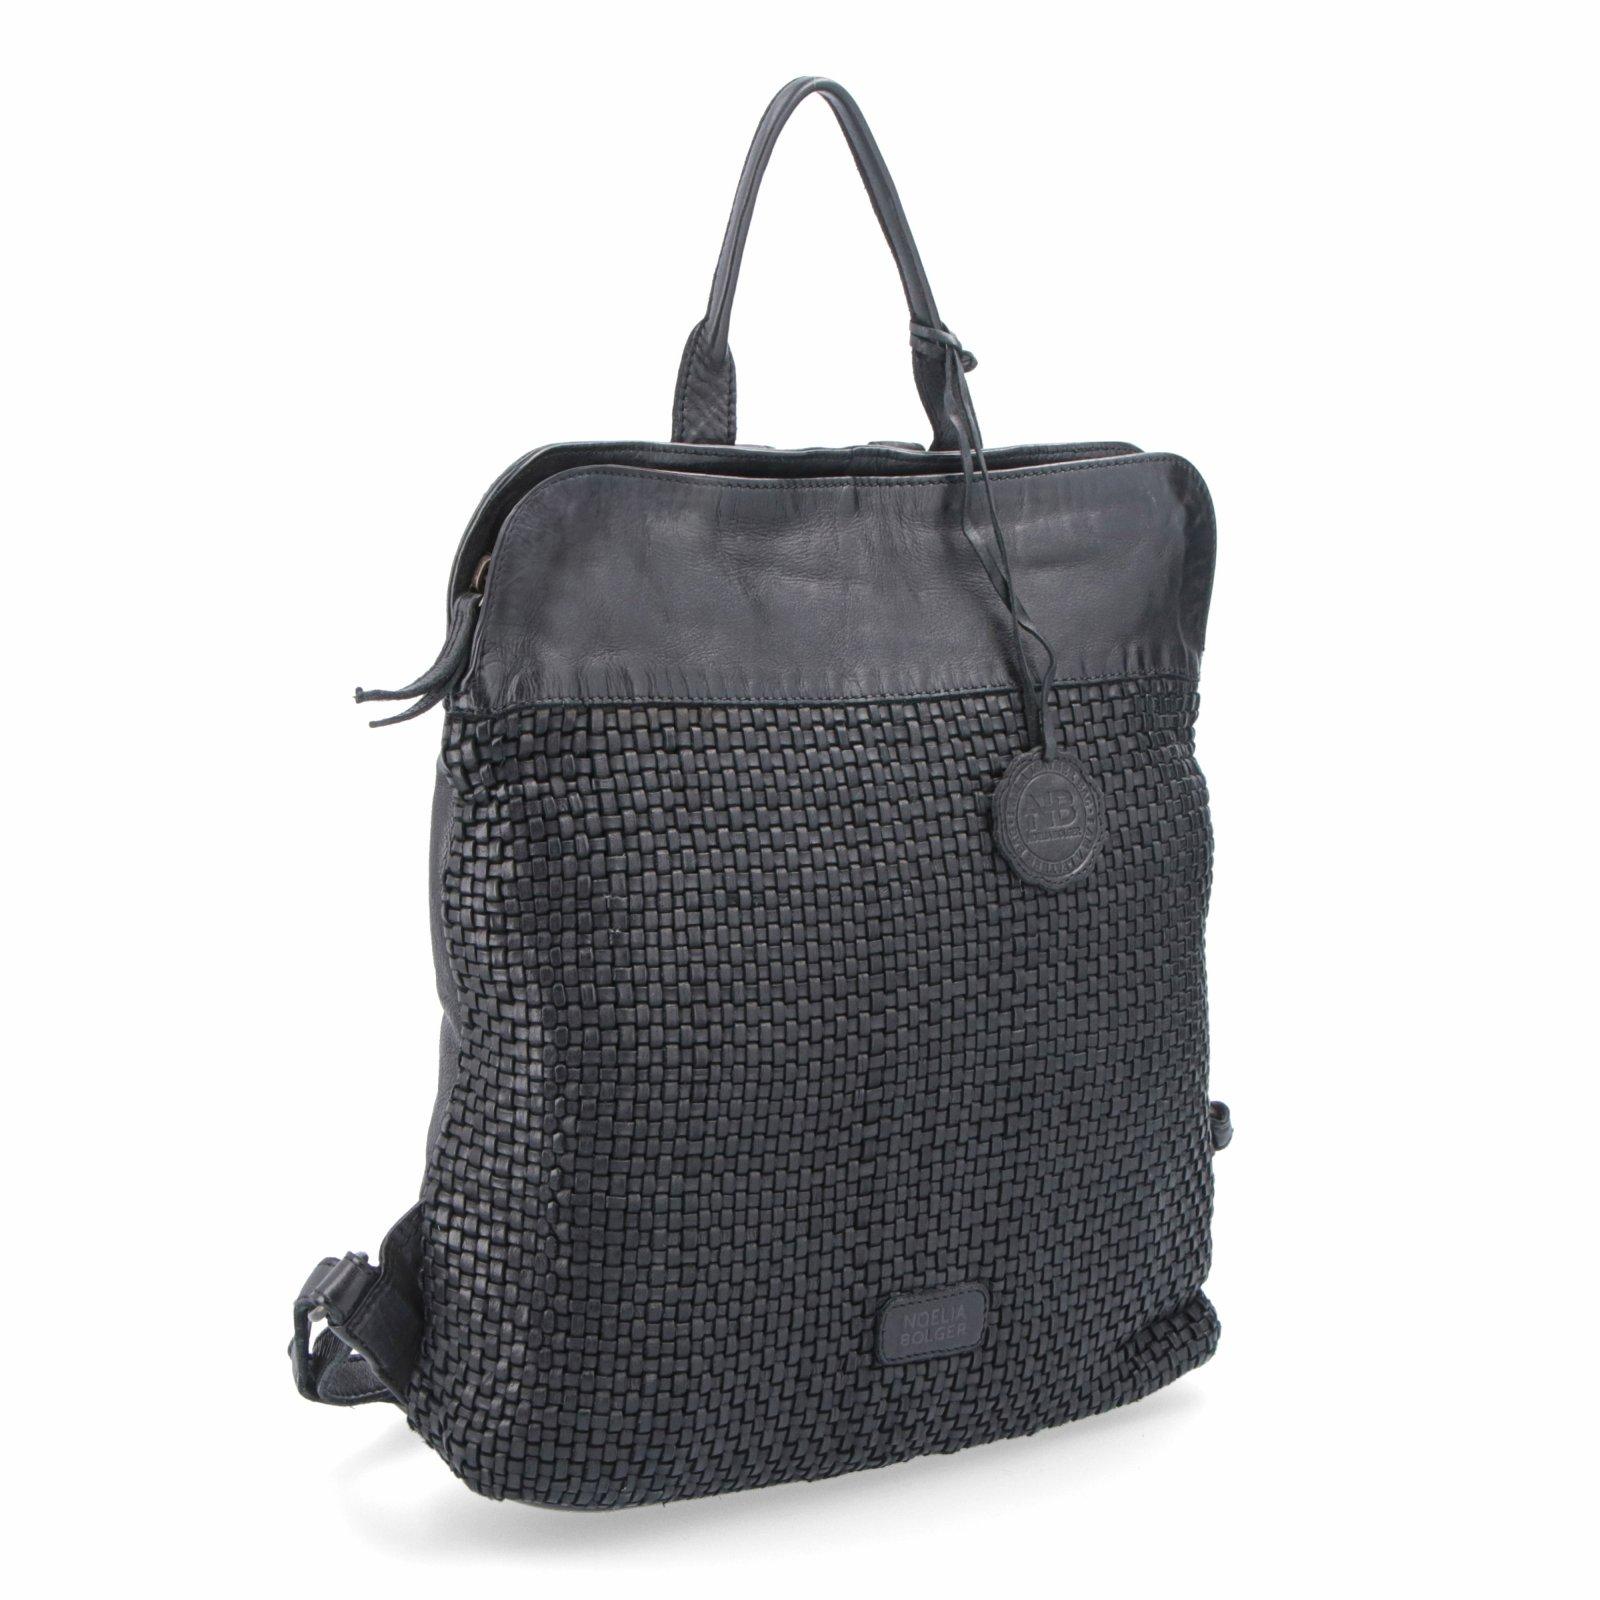 Kožený batoh Noelia Bolger – NB 2019 C